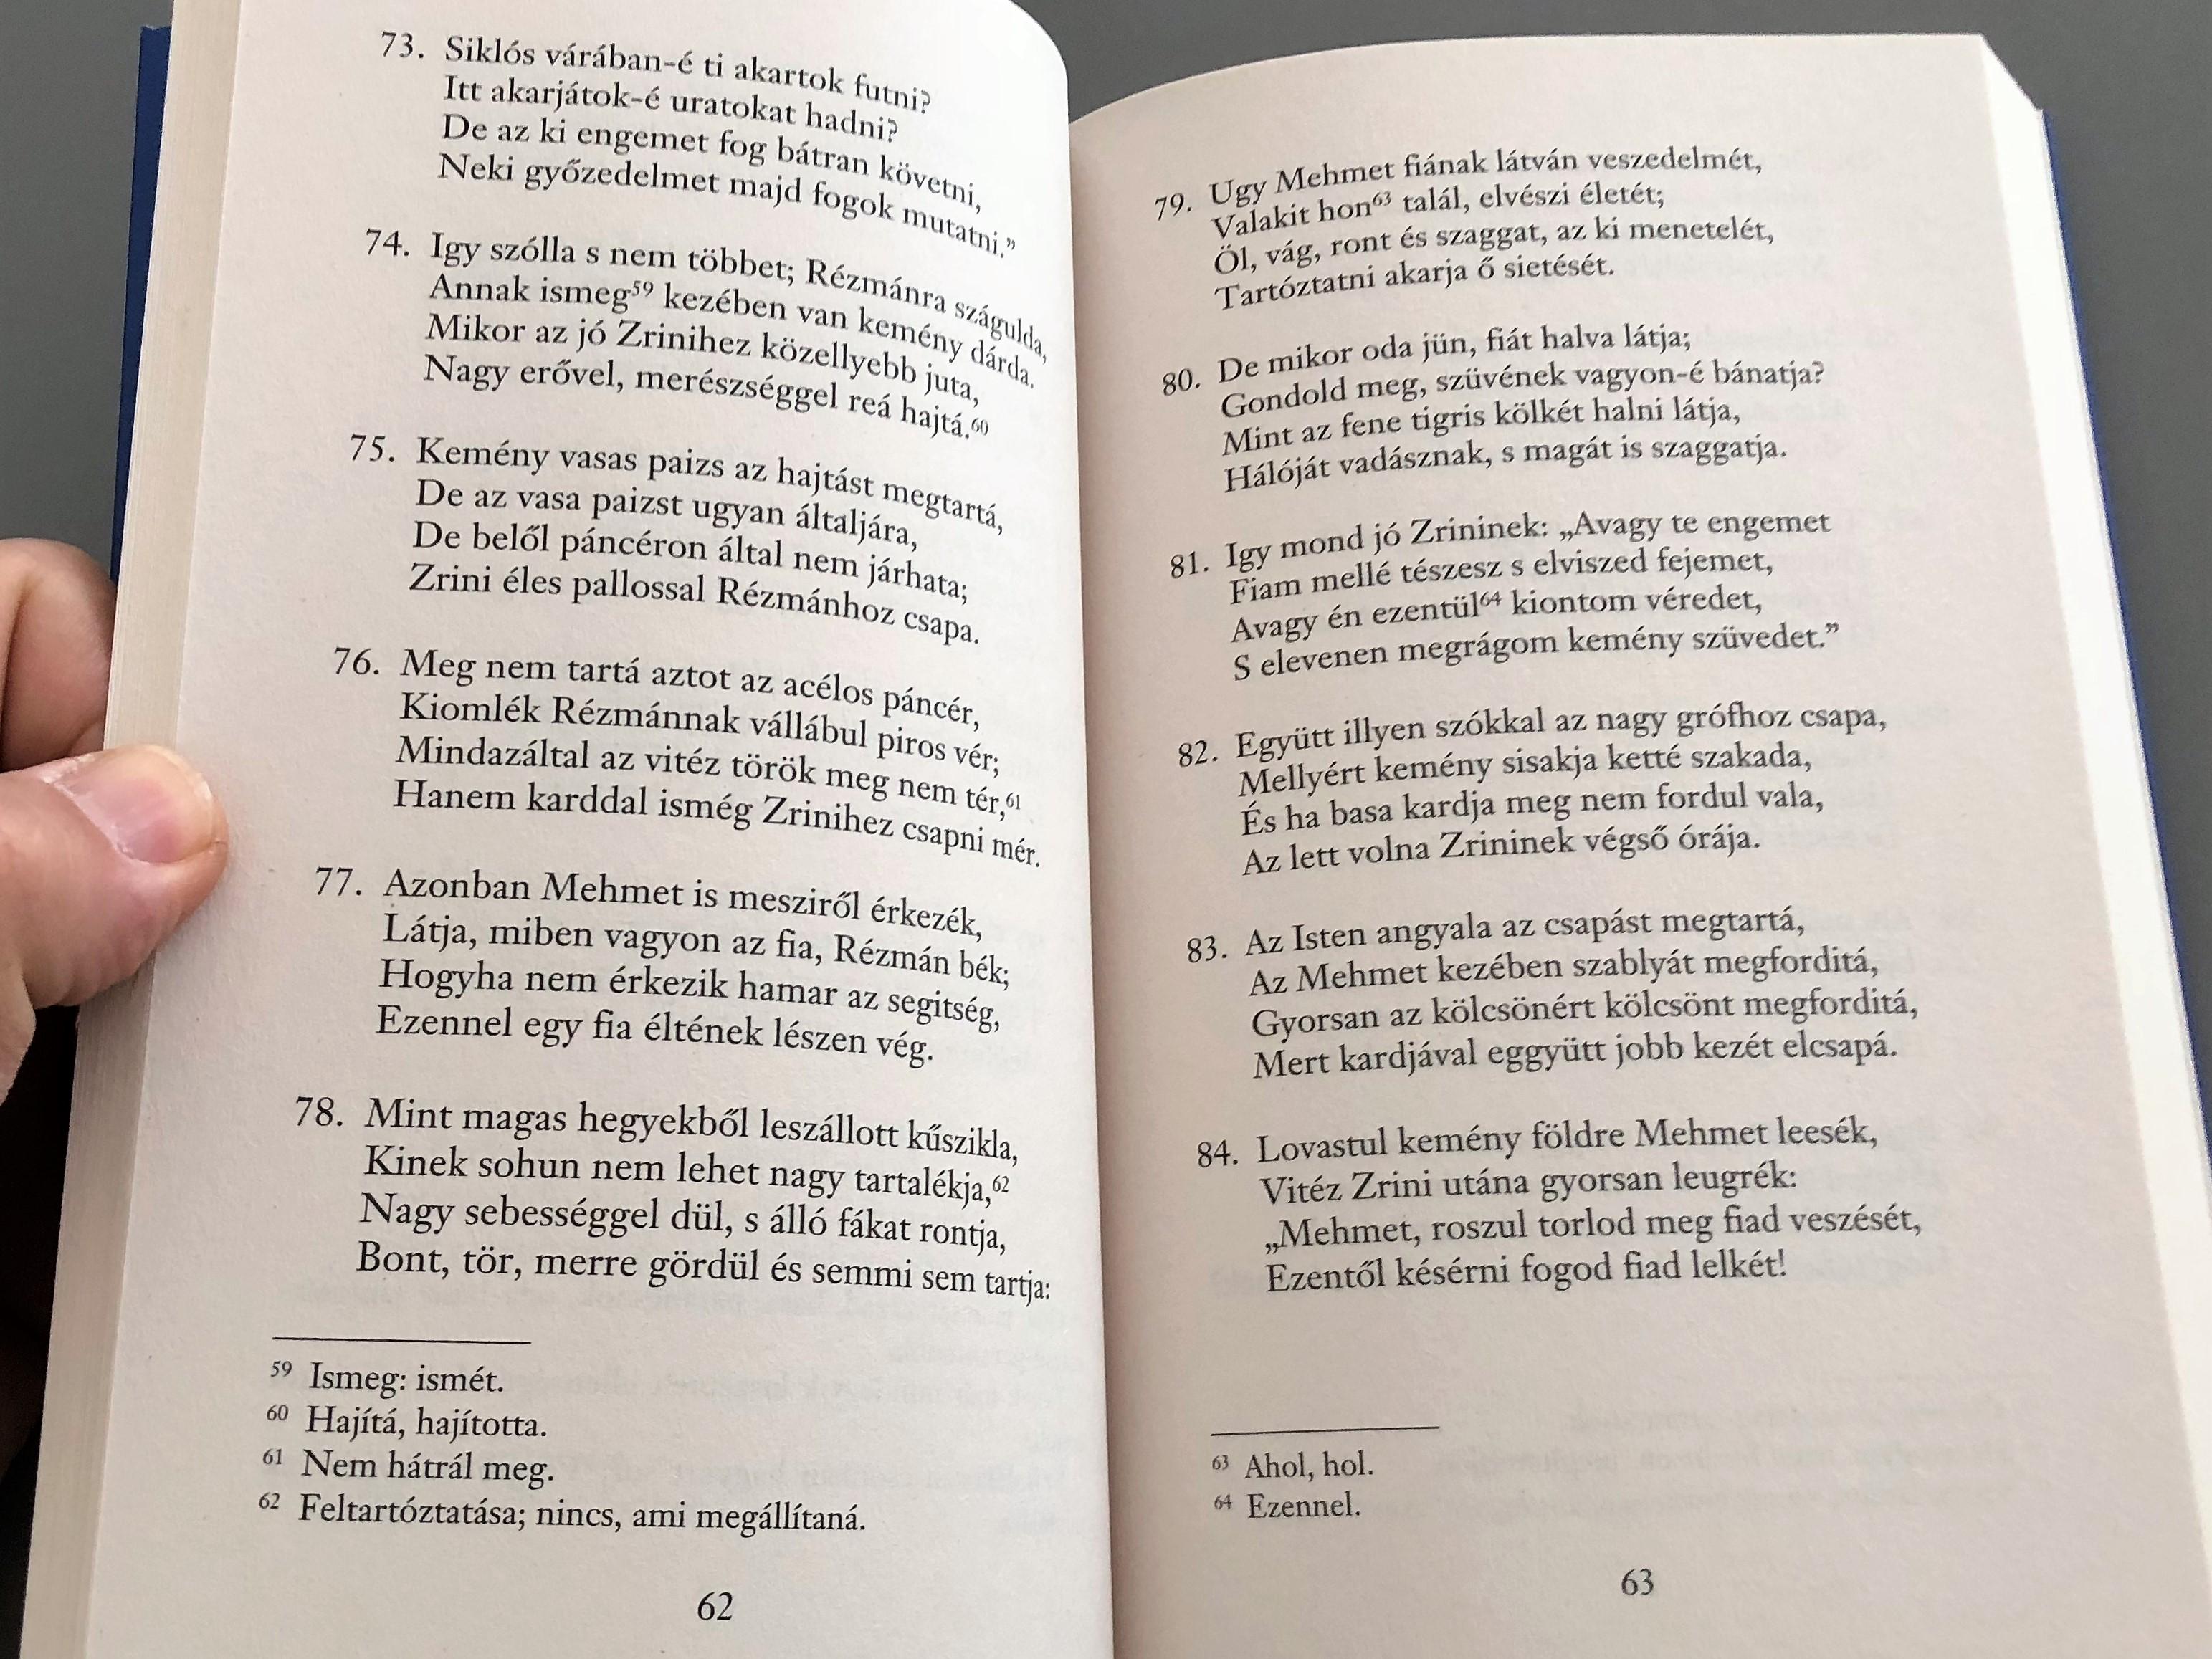 -szigeti-veszedelem-by-zr-nyi-mikl-s-letresz-l-olvasm-nyok-the-siege-of-sziget-hungarian-epic-poem-kossuth-kiad-2017-paperback-4-.jpg